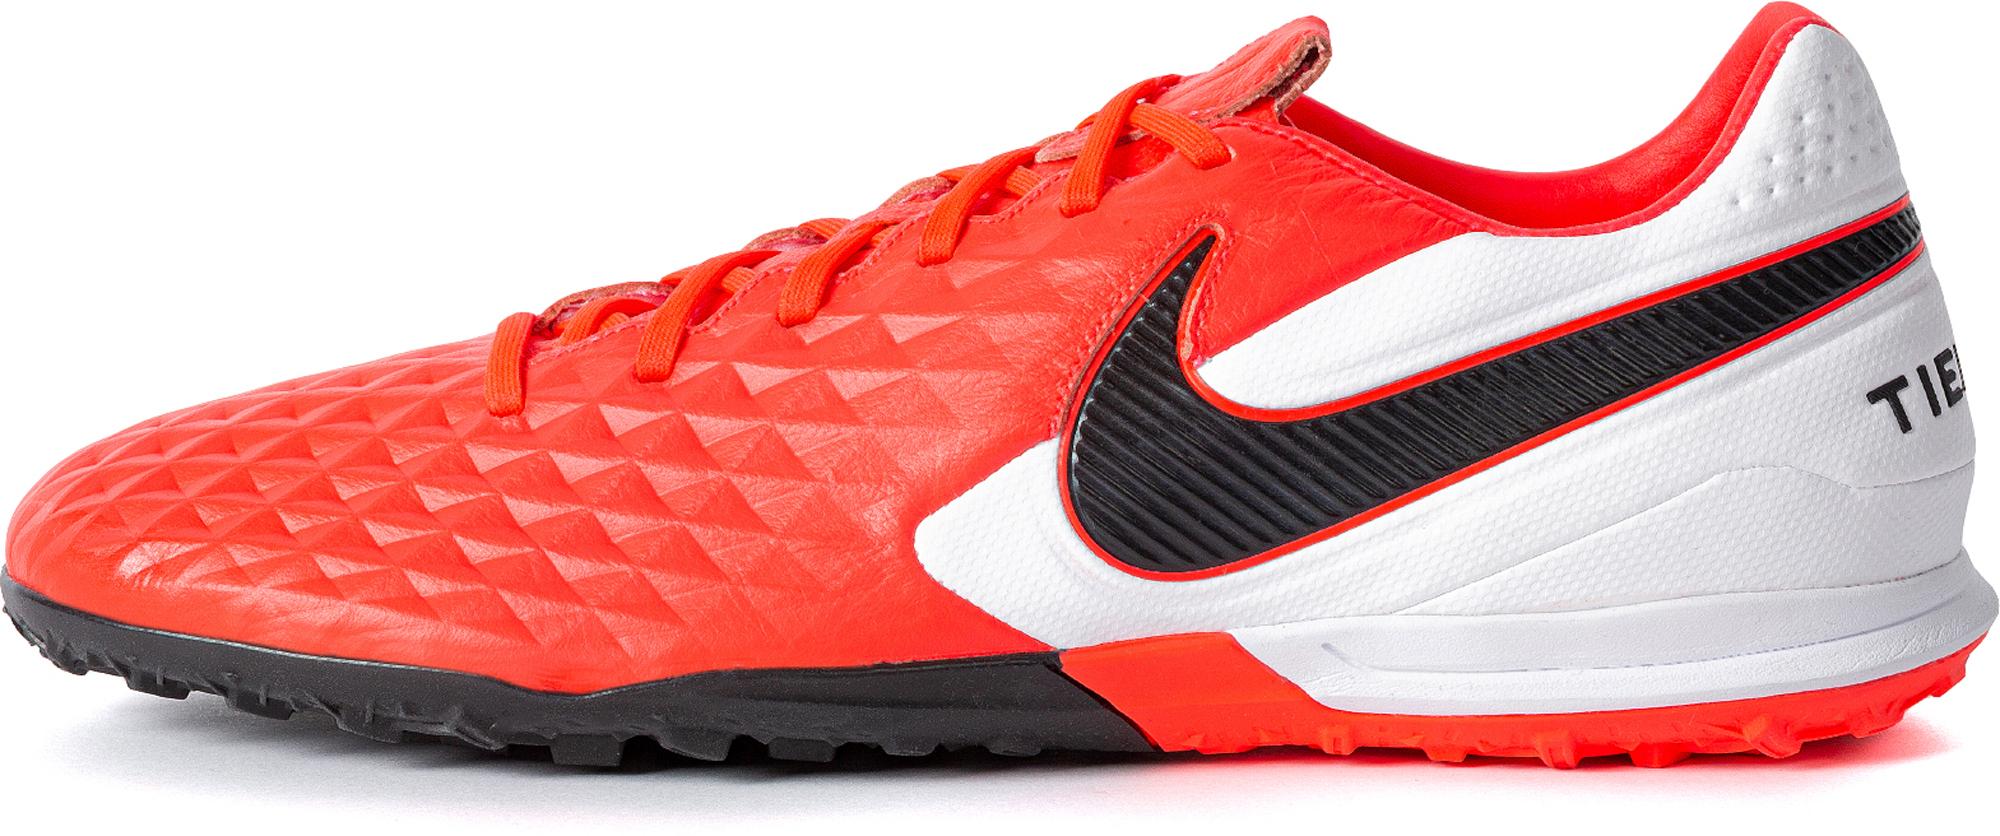 Nike Бутсы мужские Nike Tiempo Legend 8 Pro TF, размер 39 nike бутсы мужские nike nike bravatax ii tf